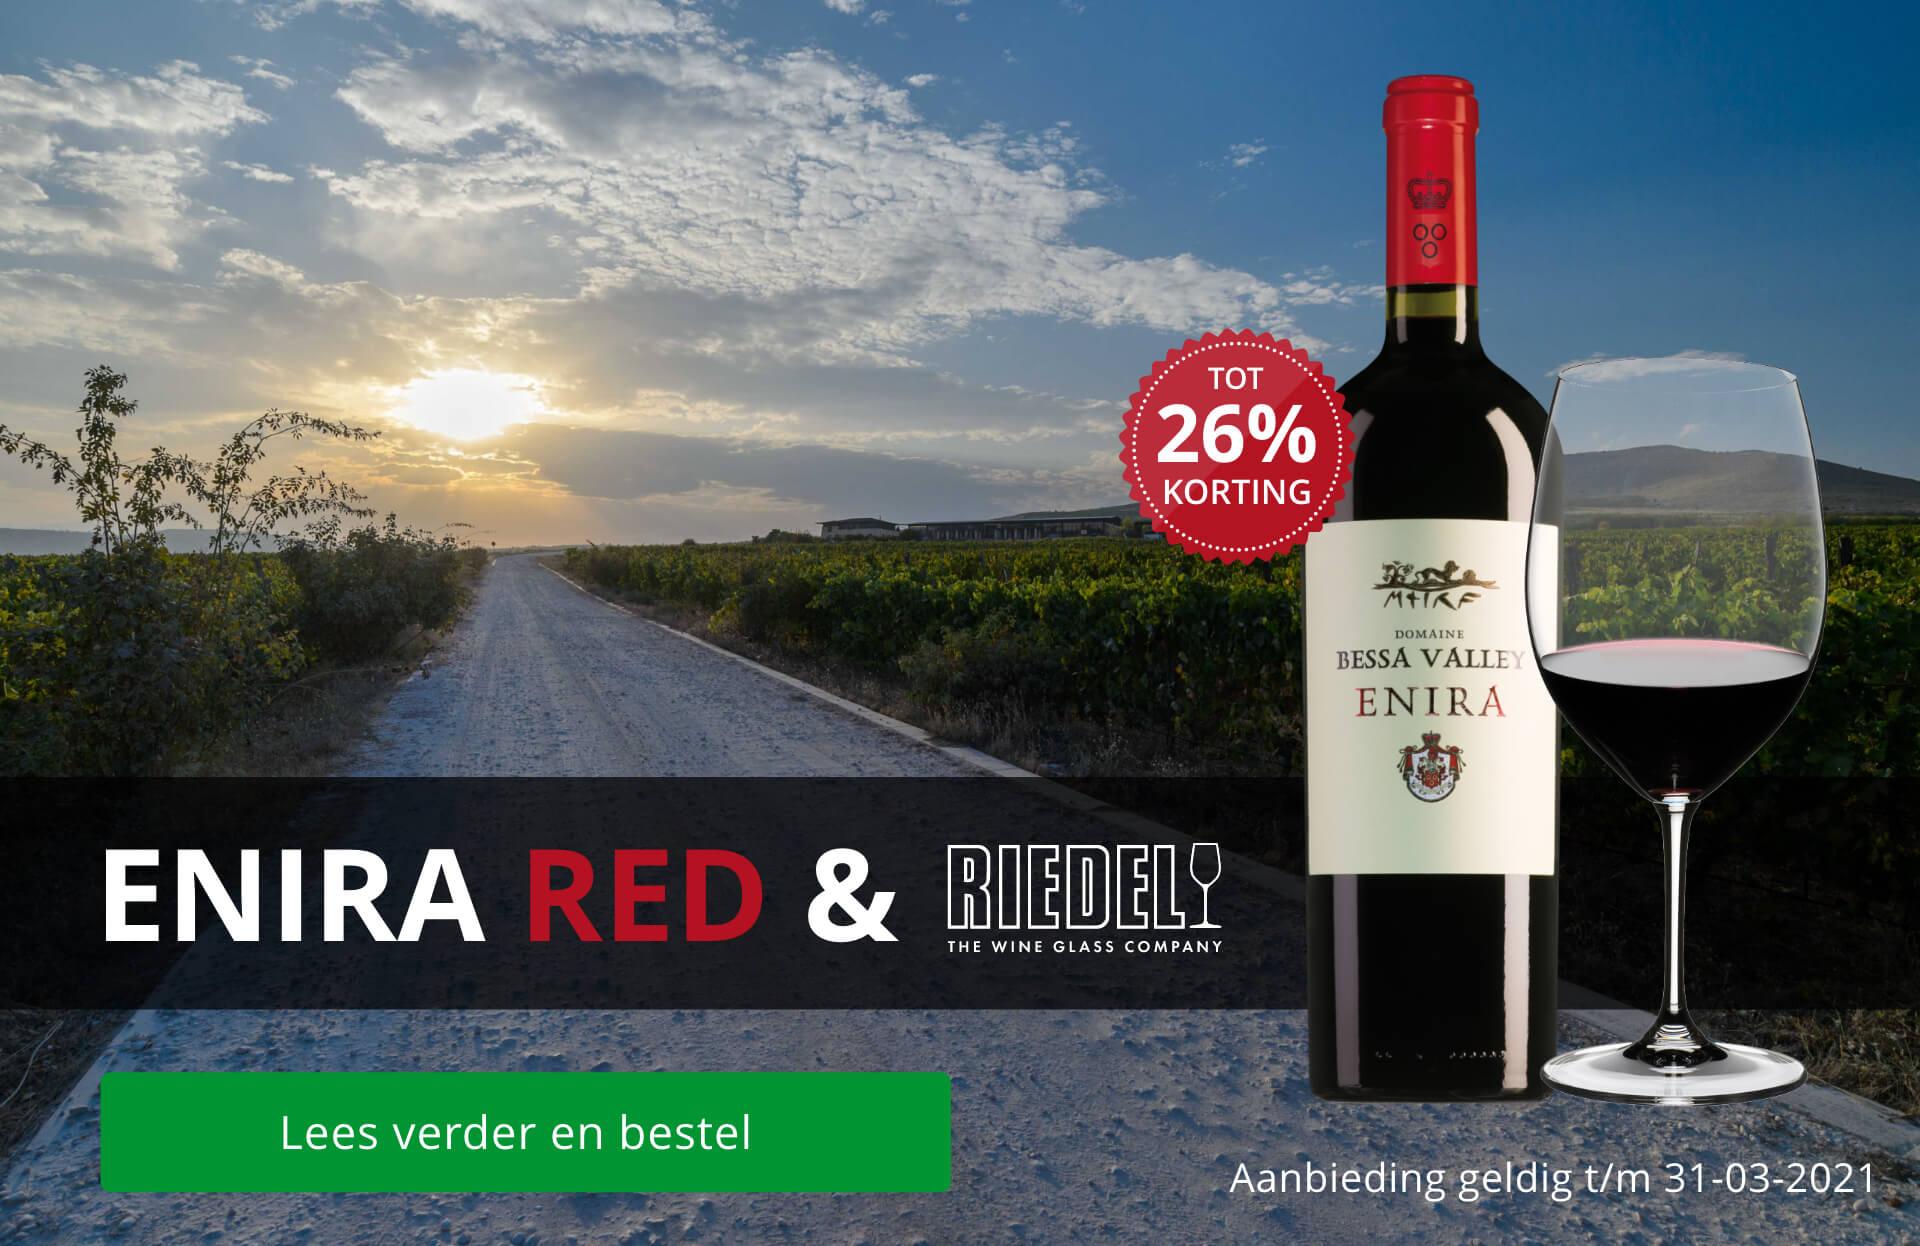 Enira Red & Riedel